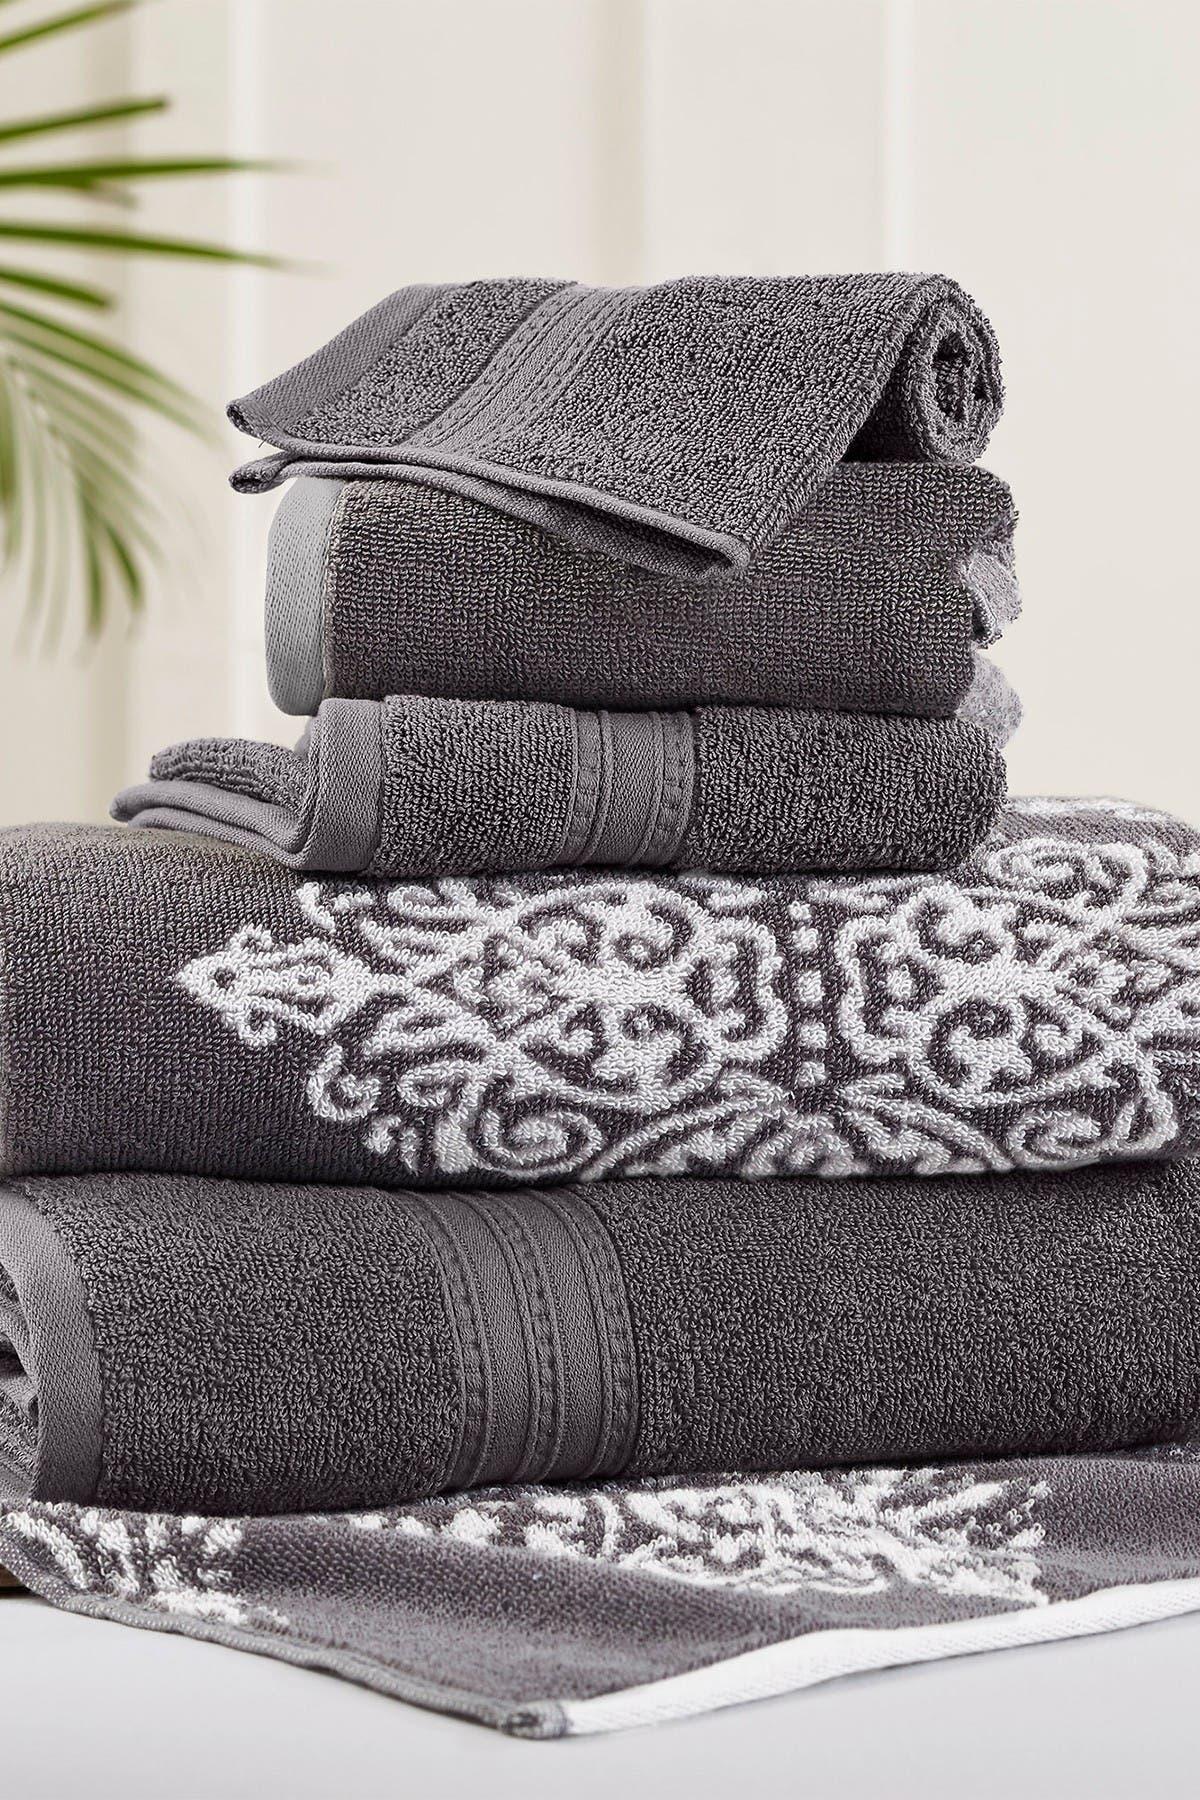 Modern Threads Platinum Artesia Damask Reversible Yarn-Dyed Jacquard 6-Piece Towel Set at Nordstrom Rack